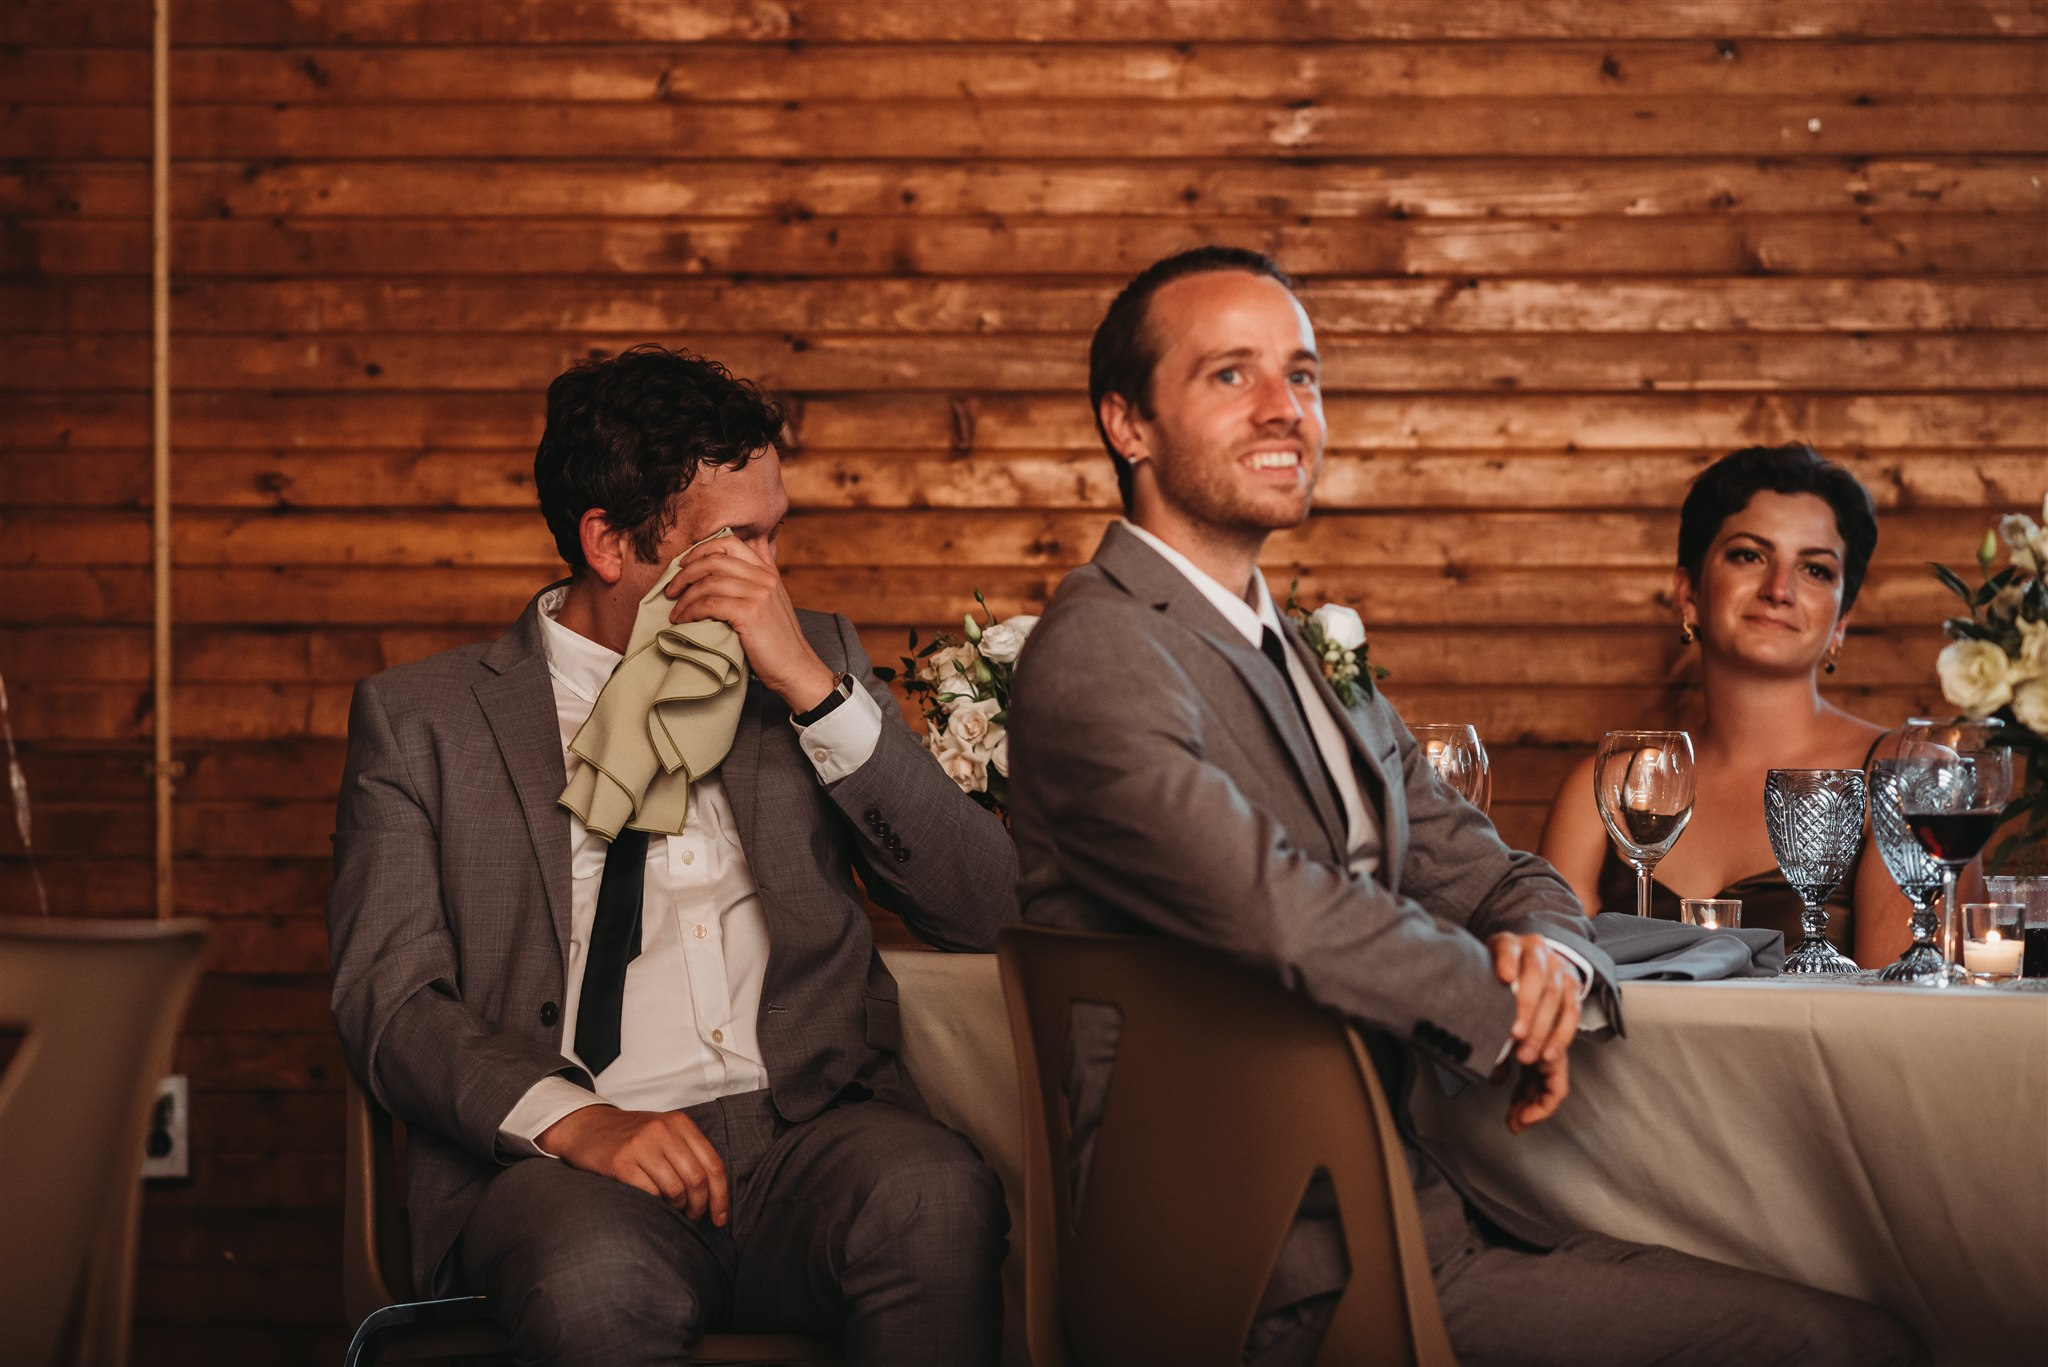 fanshawe conservation area wedding photos 495 1 - Watson Porter Pavillion Wedding